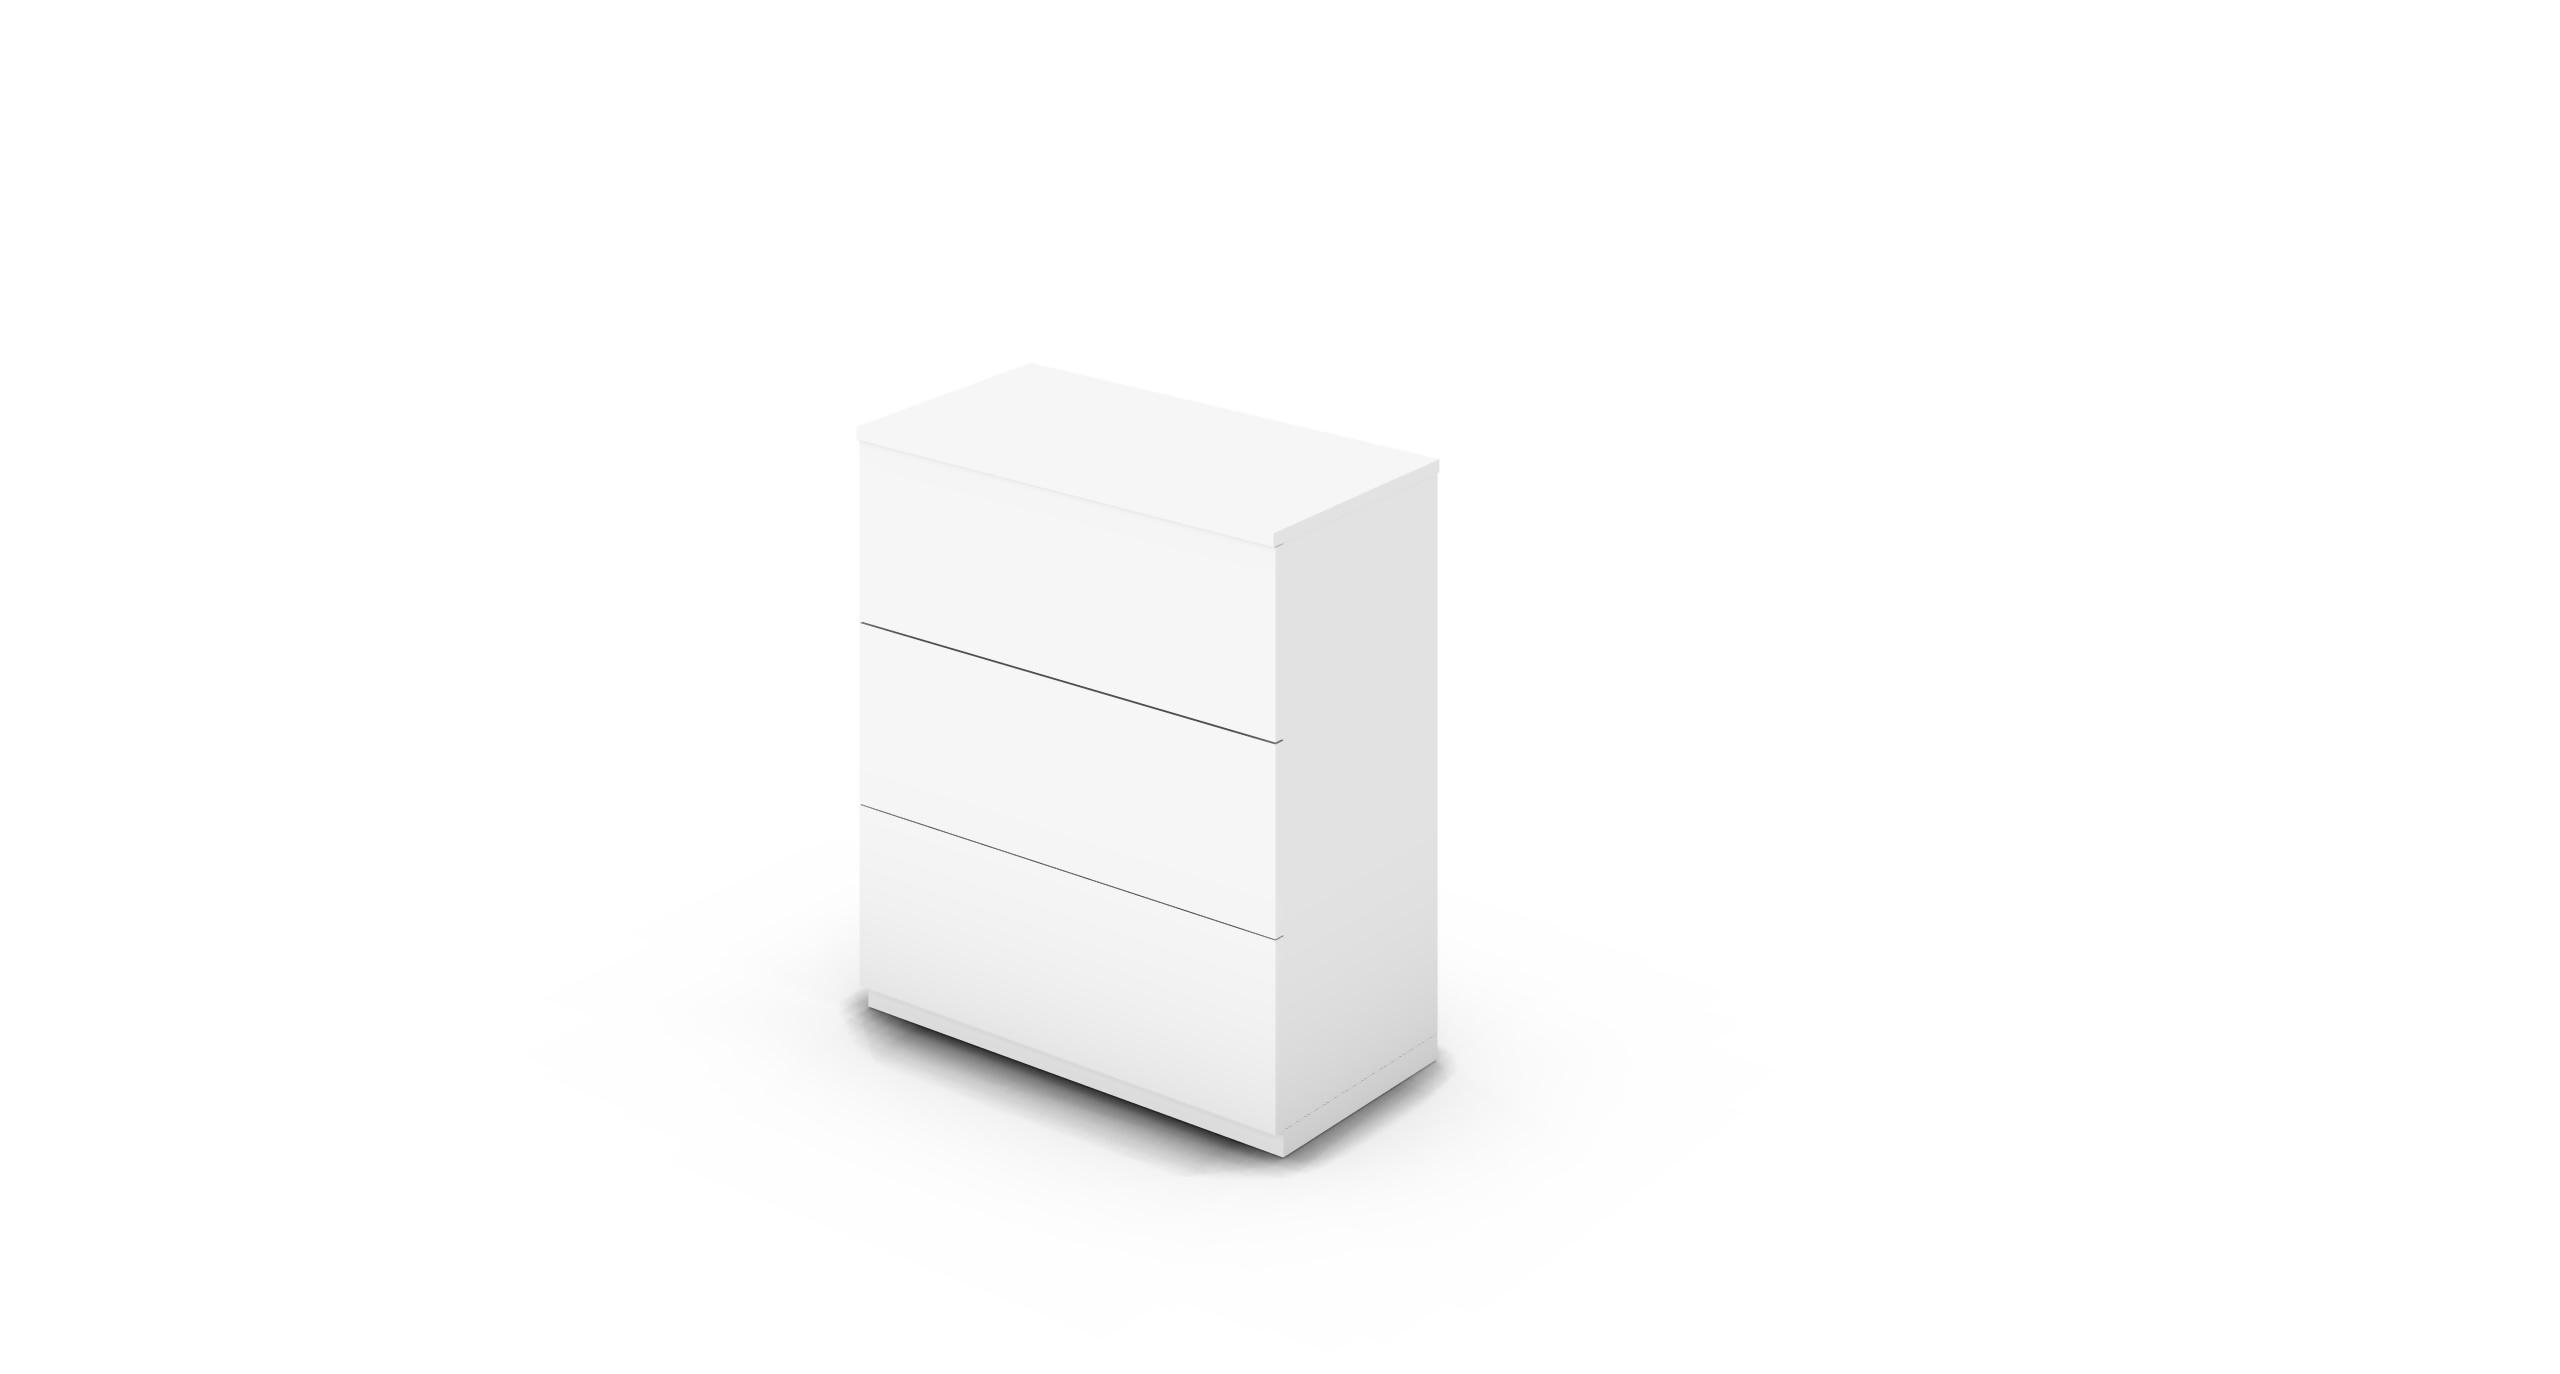 Cabinet_900x450x1125_DR_White_Push_NoCylinder